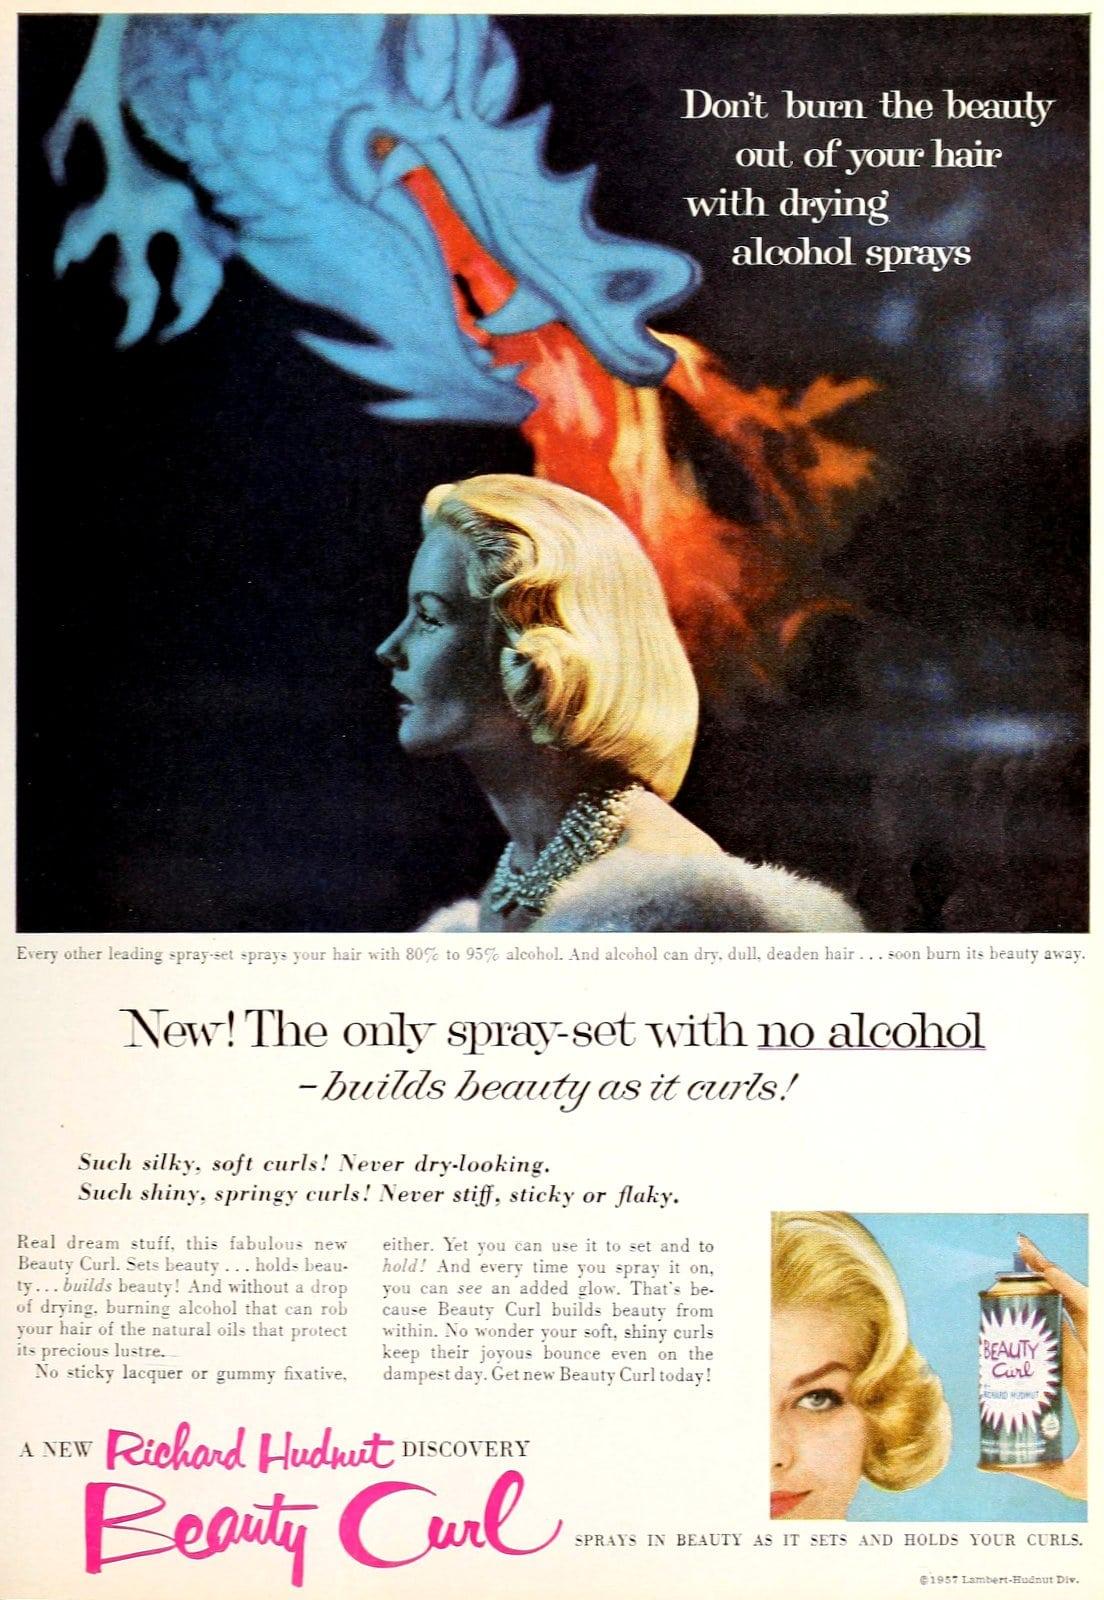 Retro 1950s hairspray brands - Richard Hudnut Beauty Curl